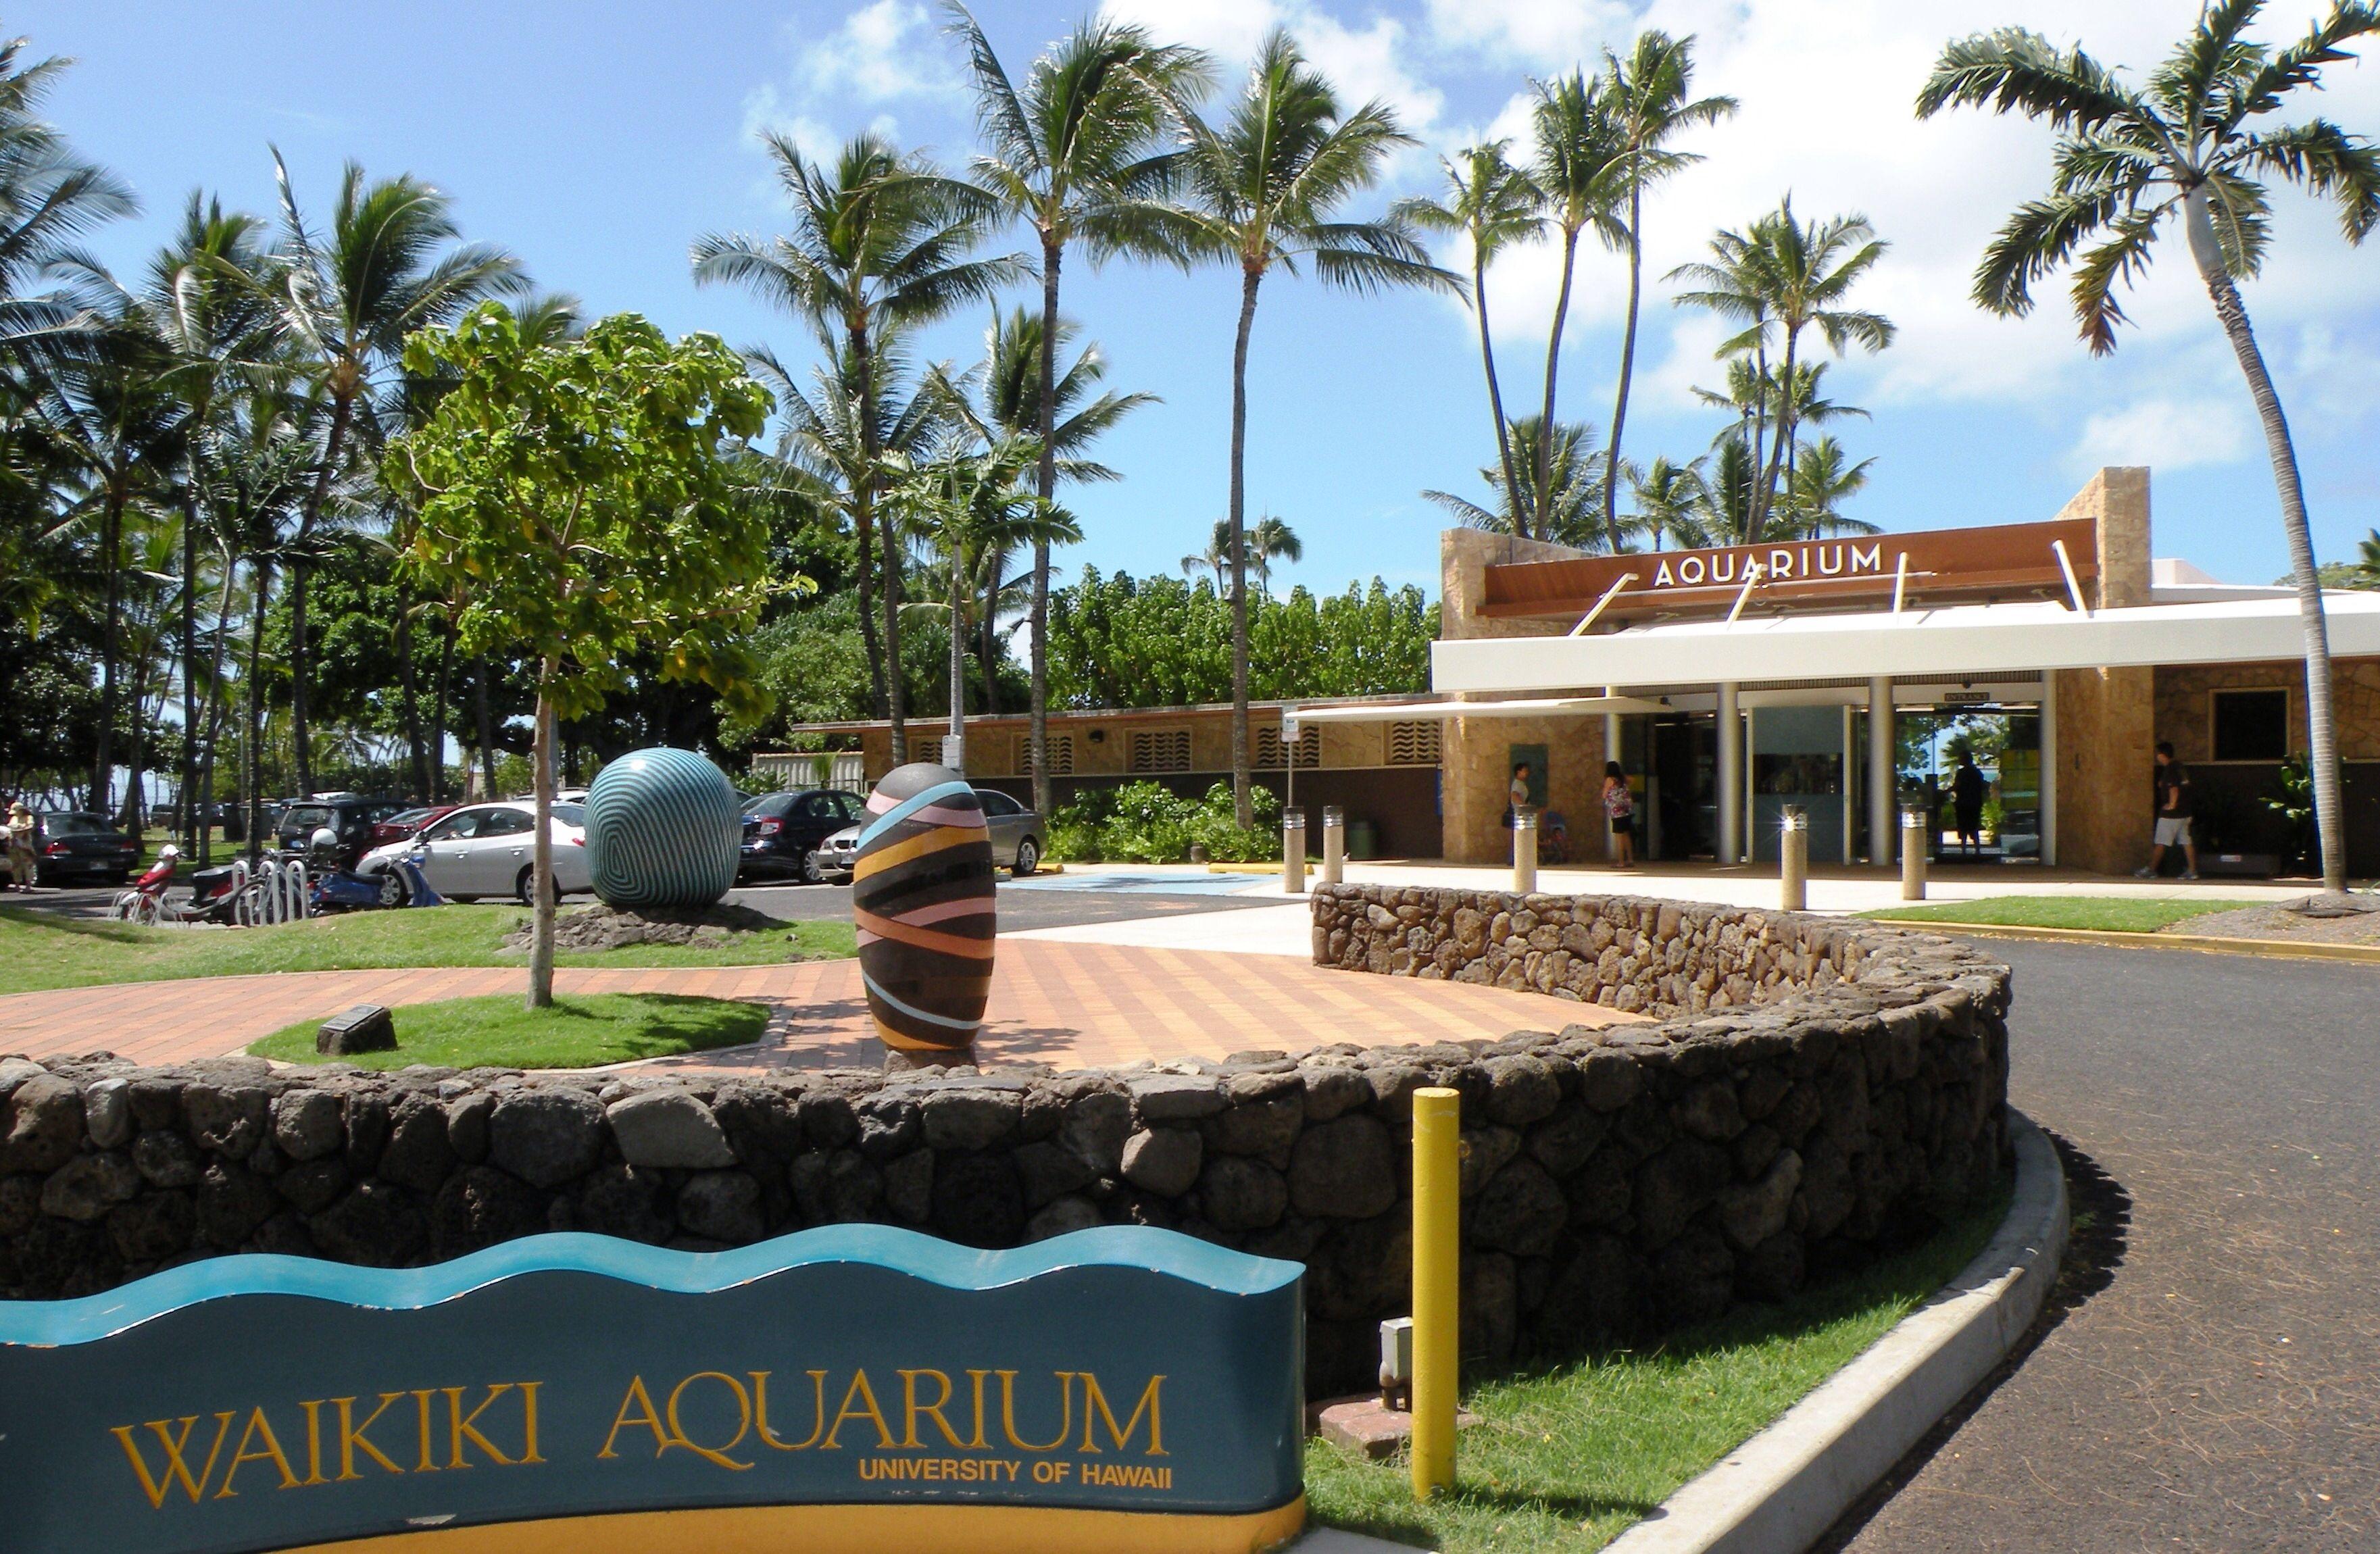 Waikiki Aquarium Kapiolani Park Honolulu Hi Founded In 1904 It Is The 2nd Oldest Aquarium In The United States Not To Waikiki Luau Waikiki Waikiki Hawaii